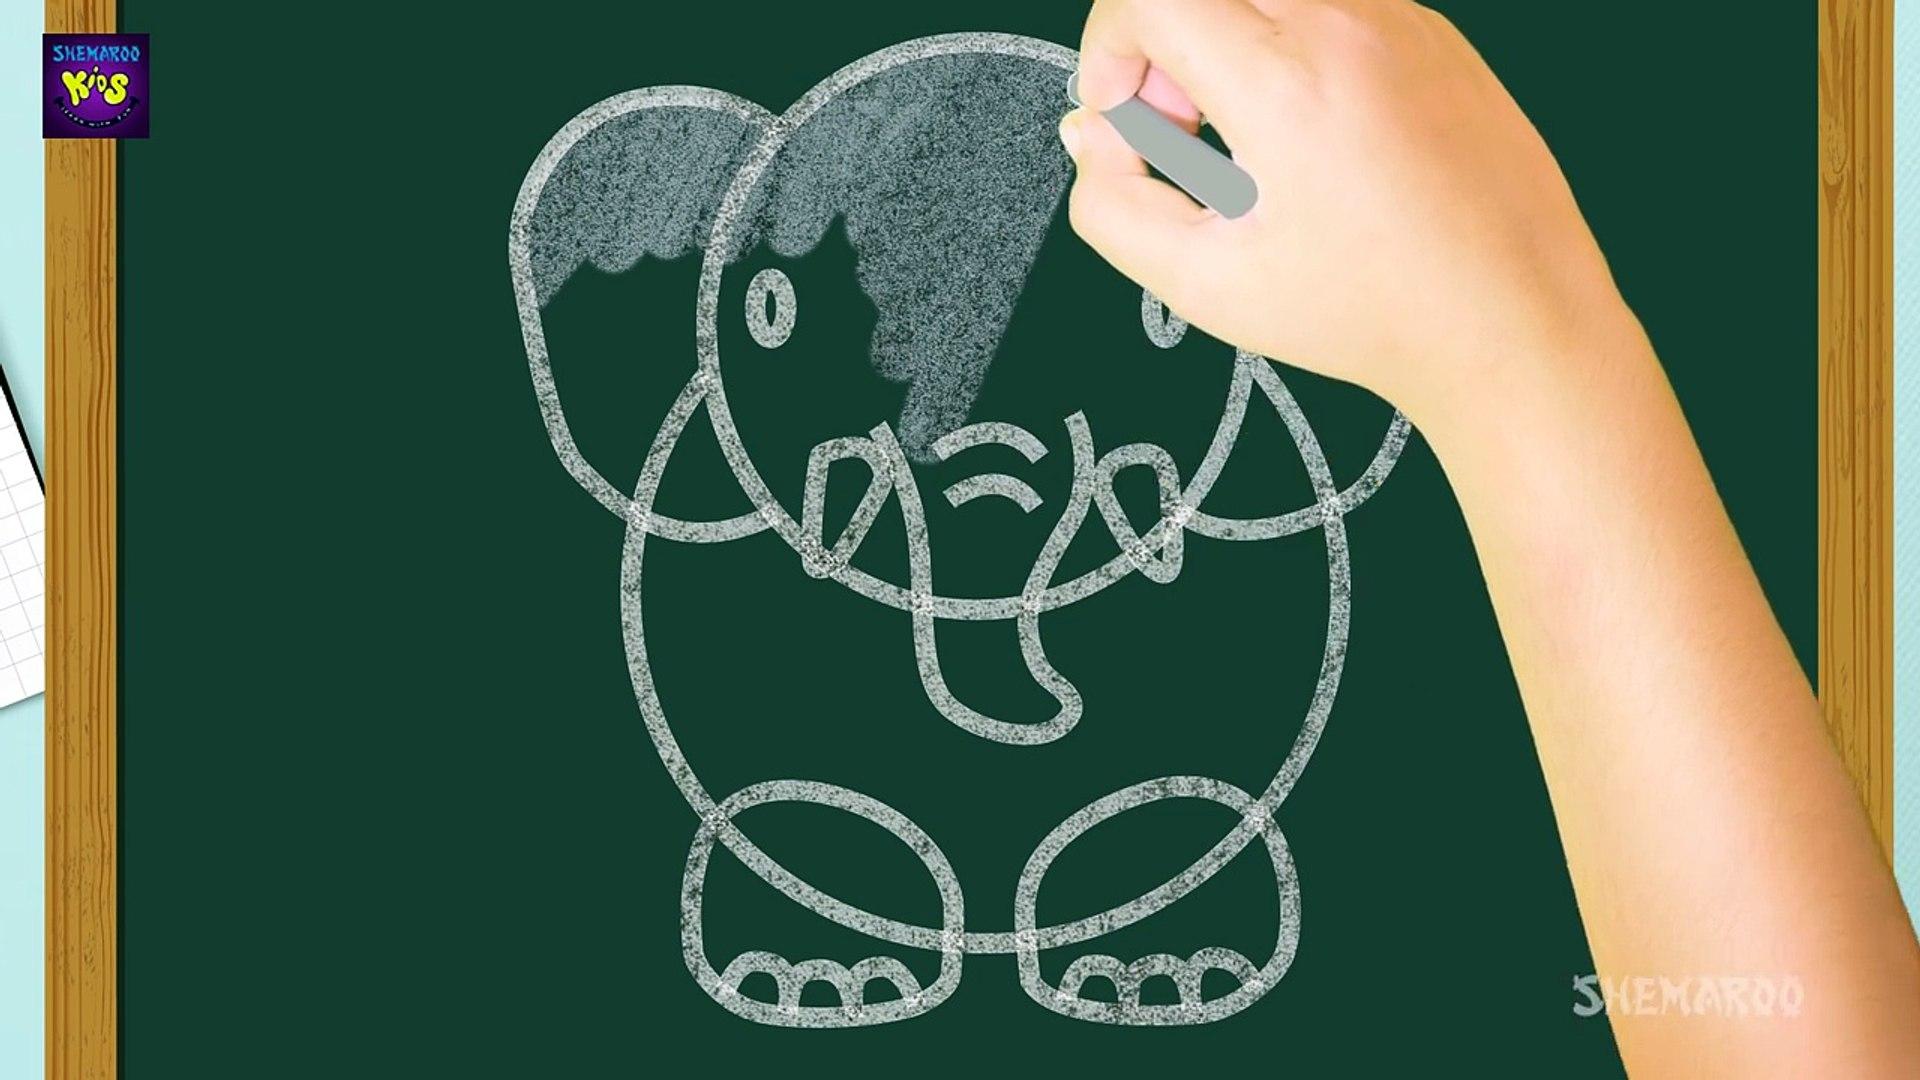 Easy Elephant Drawing for Kids _ Kids Learning Video _ Shemaroo Kids-8ZyqGTQc7Xk